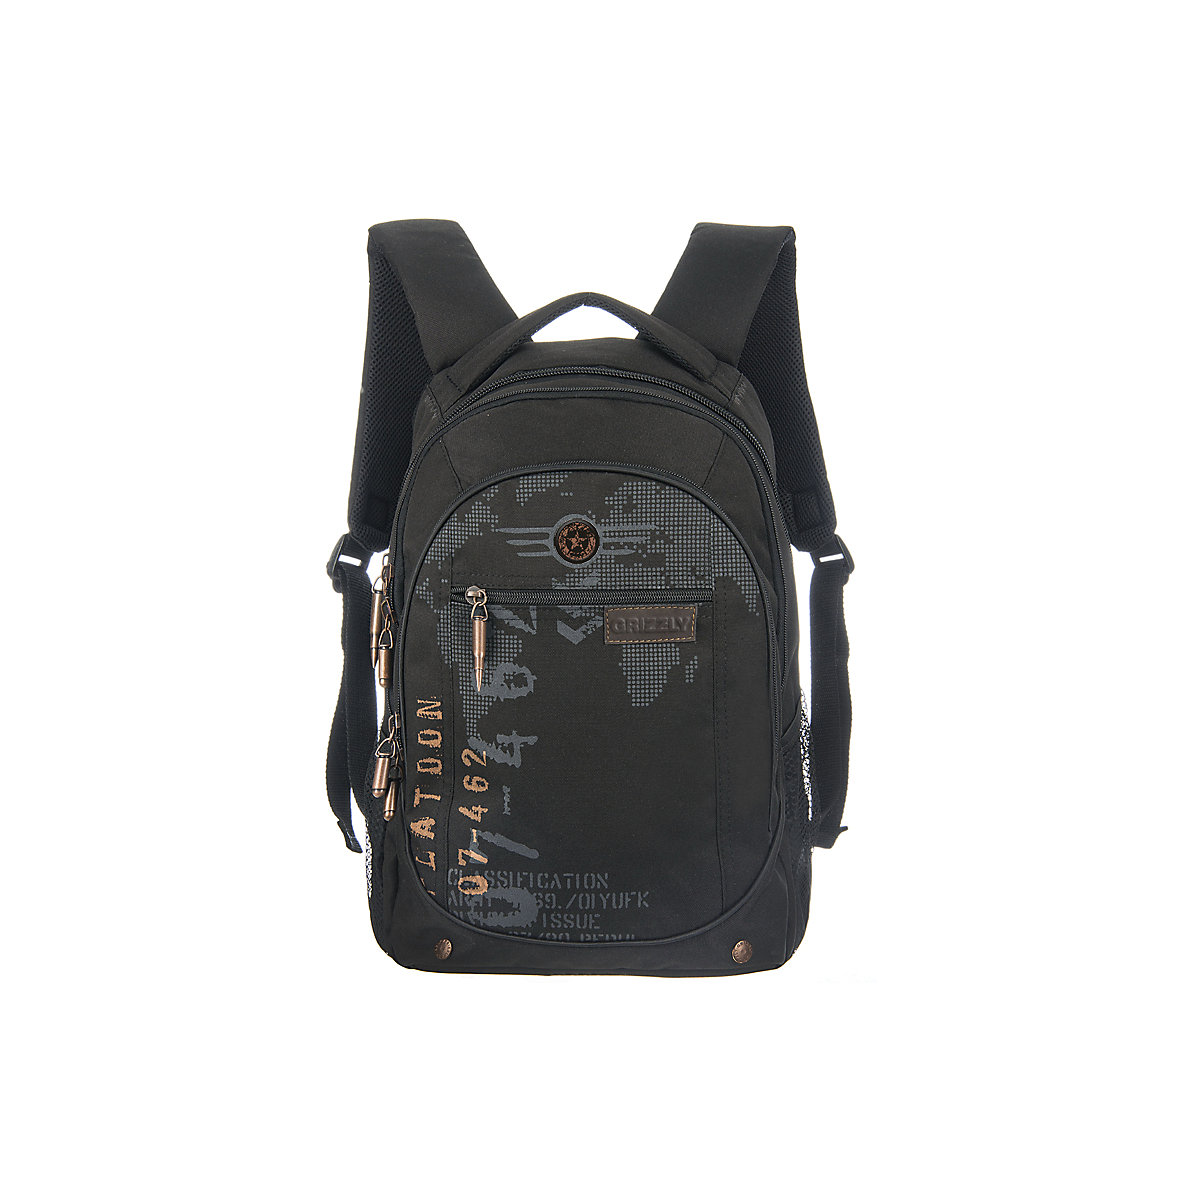 Фото - GRIZZLY School Bags 6727509 schoolbag backpack orthopedic bag for boy and girl animals women handbags 2018 new fashion summer chain ladies hand bags cartoon girl printed female crossbody pink casual tote k059